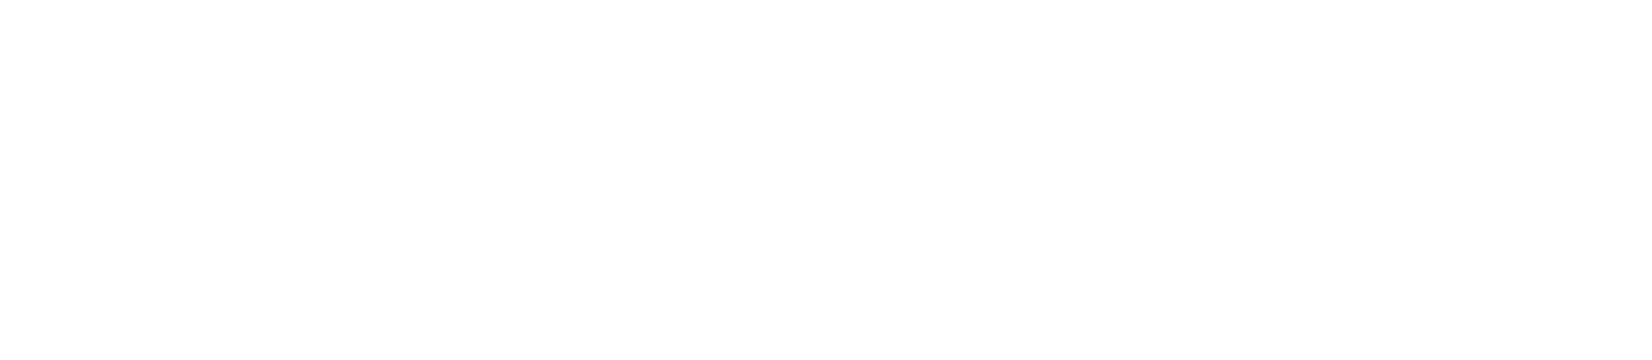 Culinary Arts Thompson Rivers University